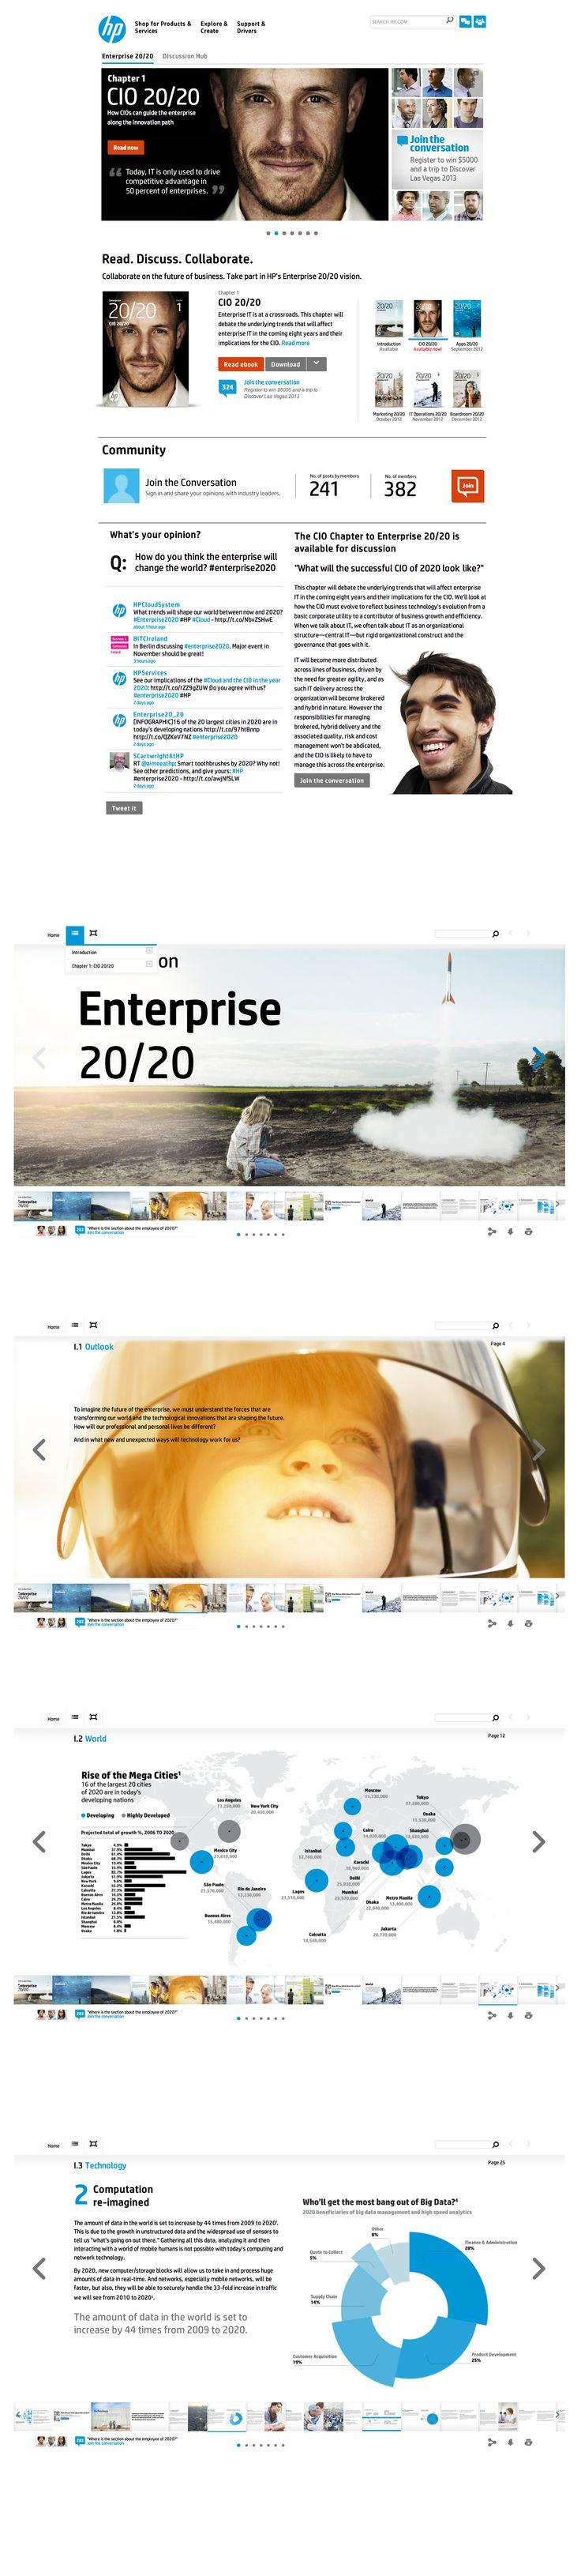 HP 20/20 - Collaborative eBook to define the vision of Enterprise.